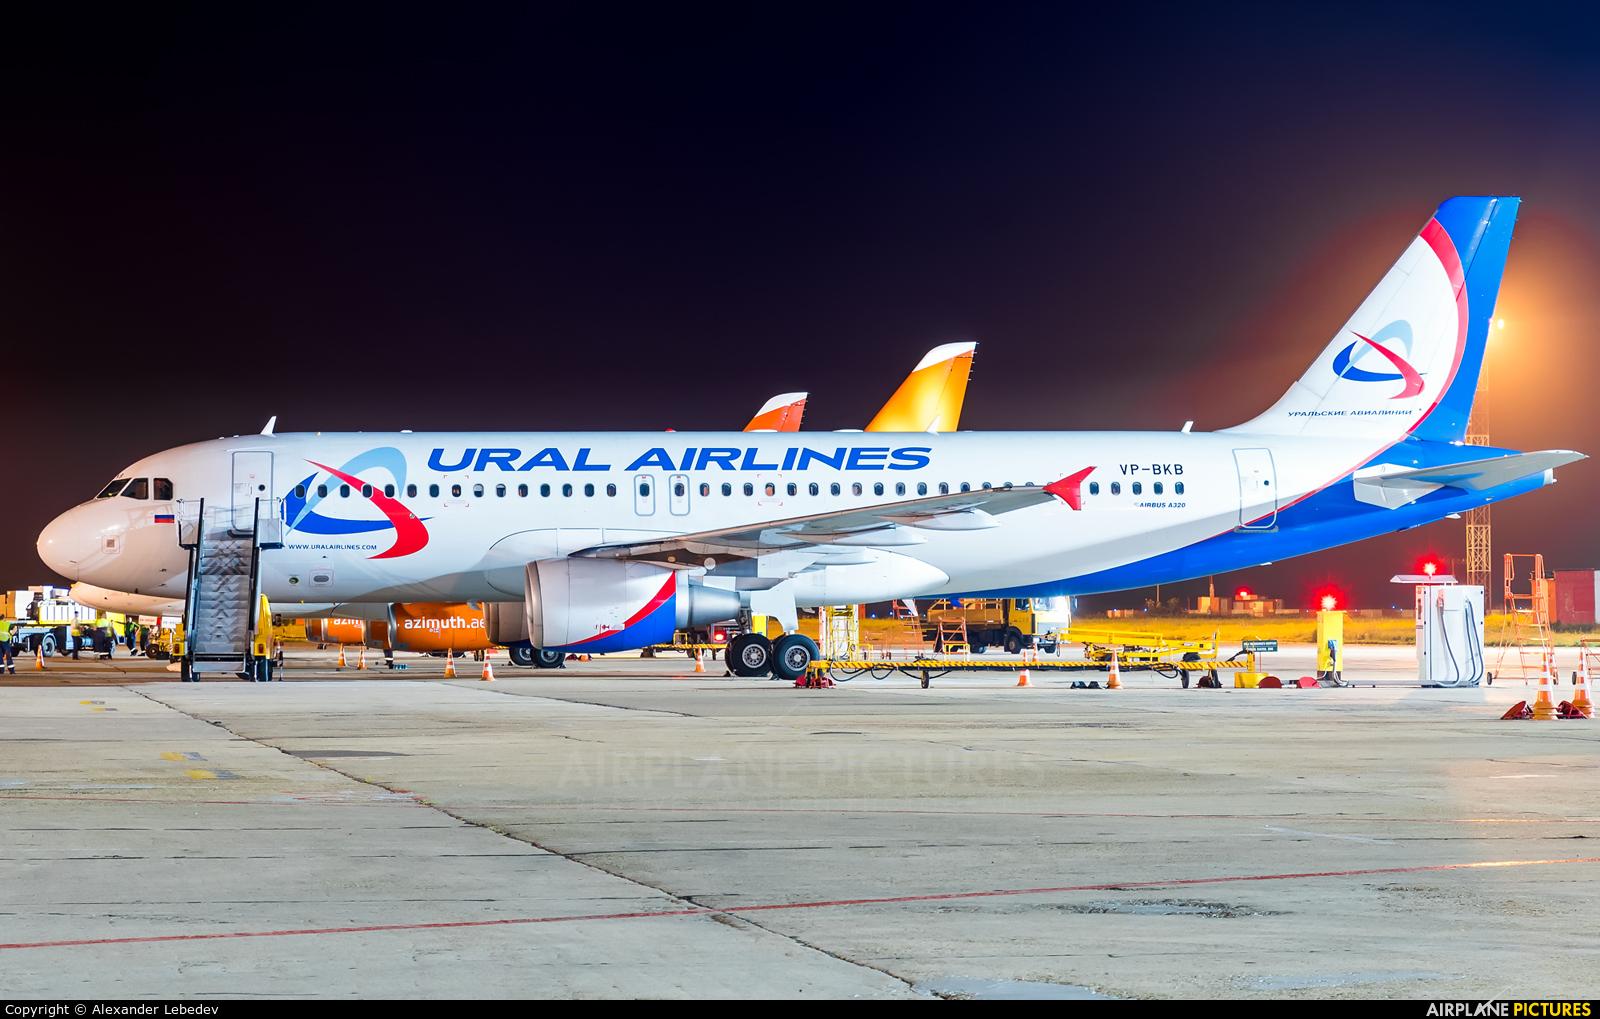 Ural Airlines VP-BKB aircraft at Krasnodar